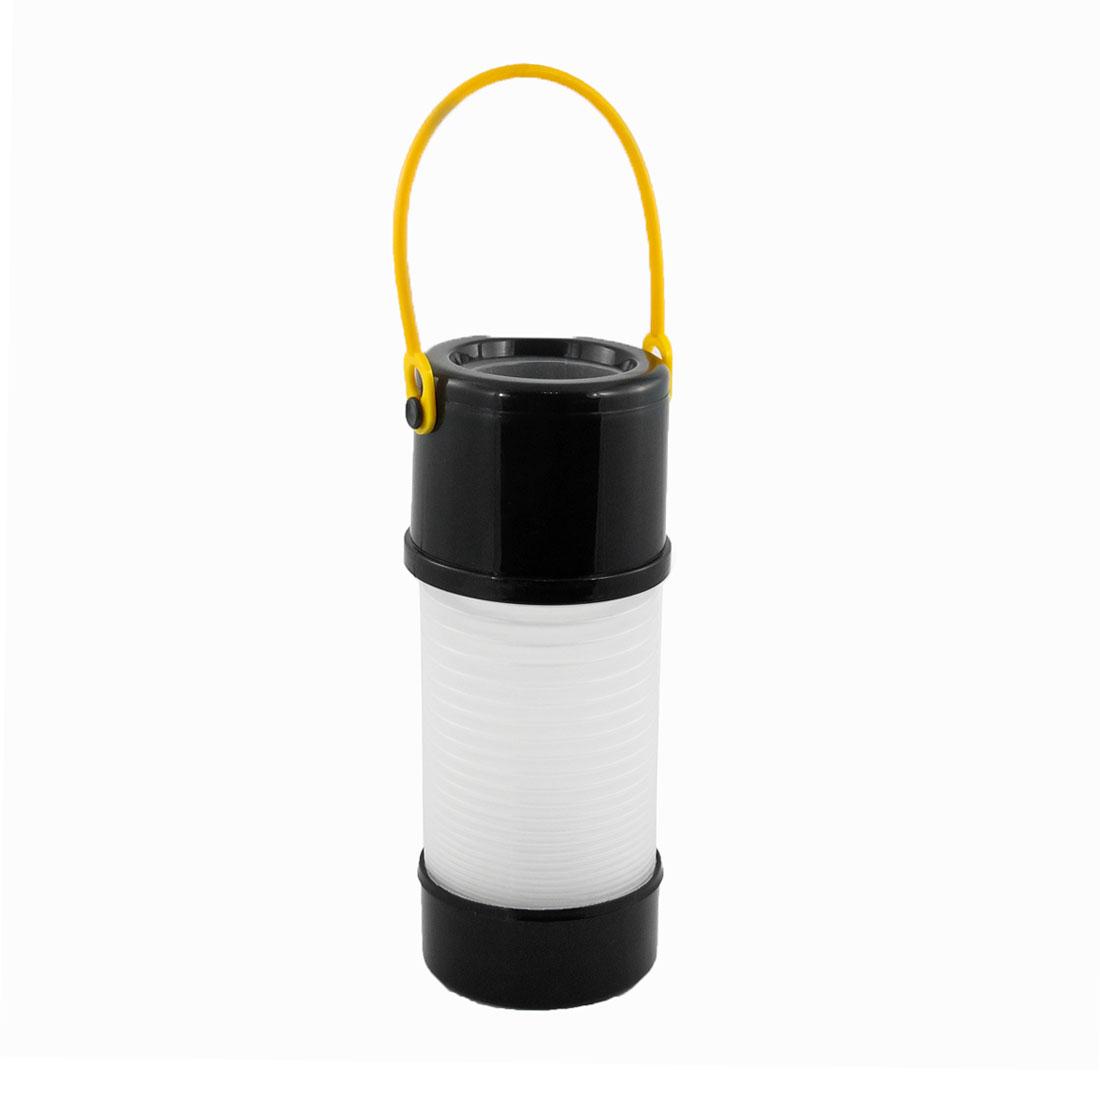 Car Black Yellow Plastic Contractible Umbrella Holder Gadget Bucket